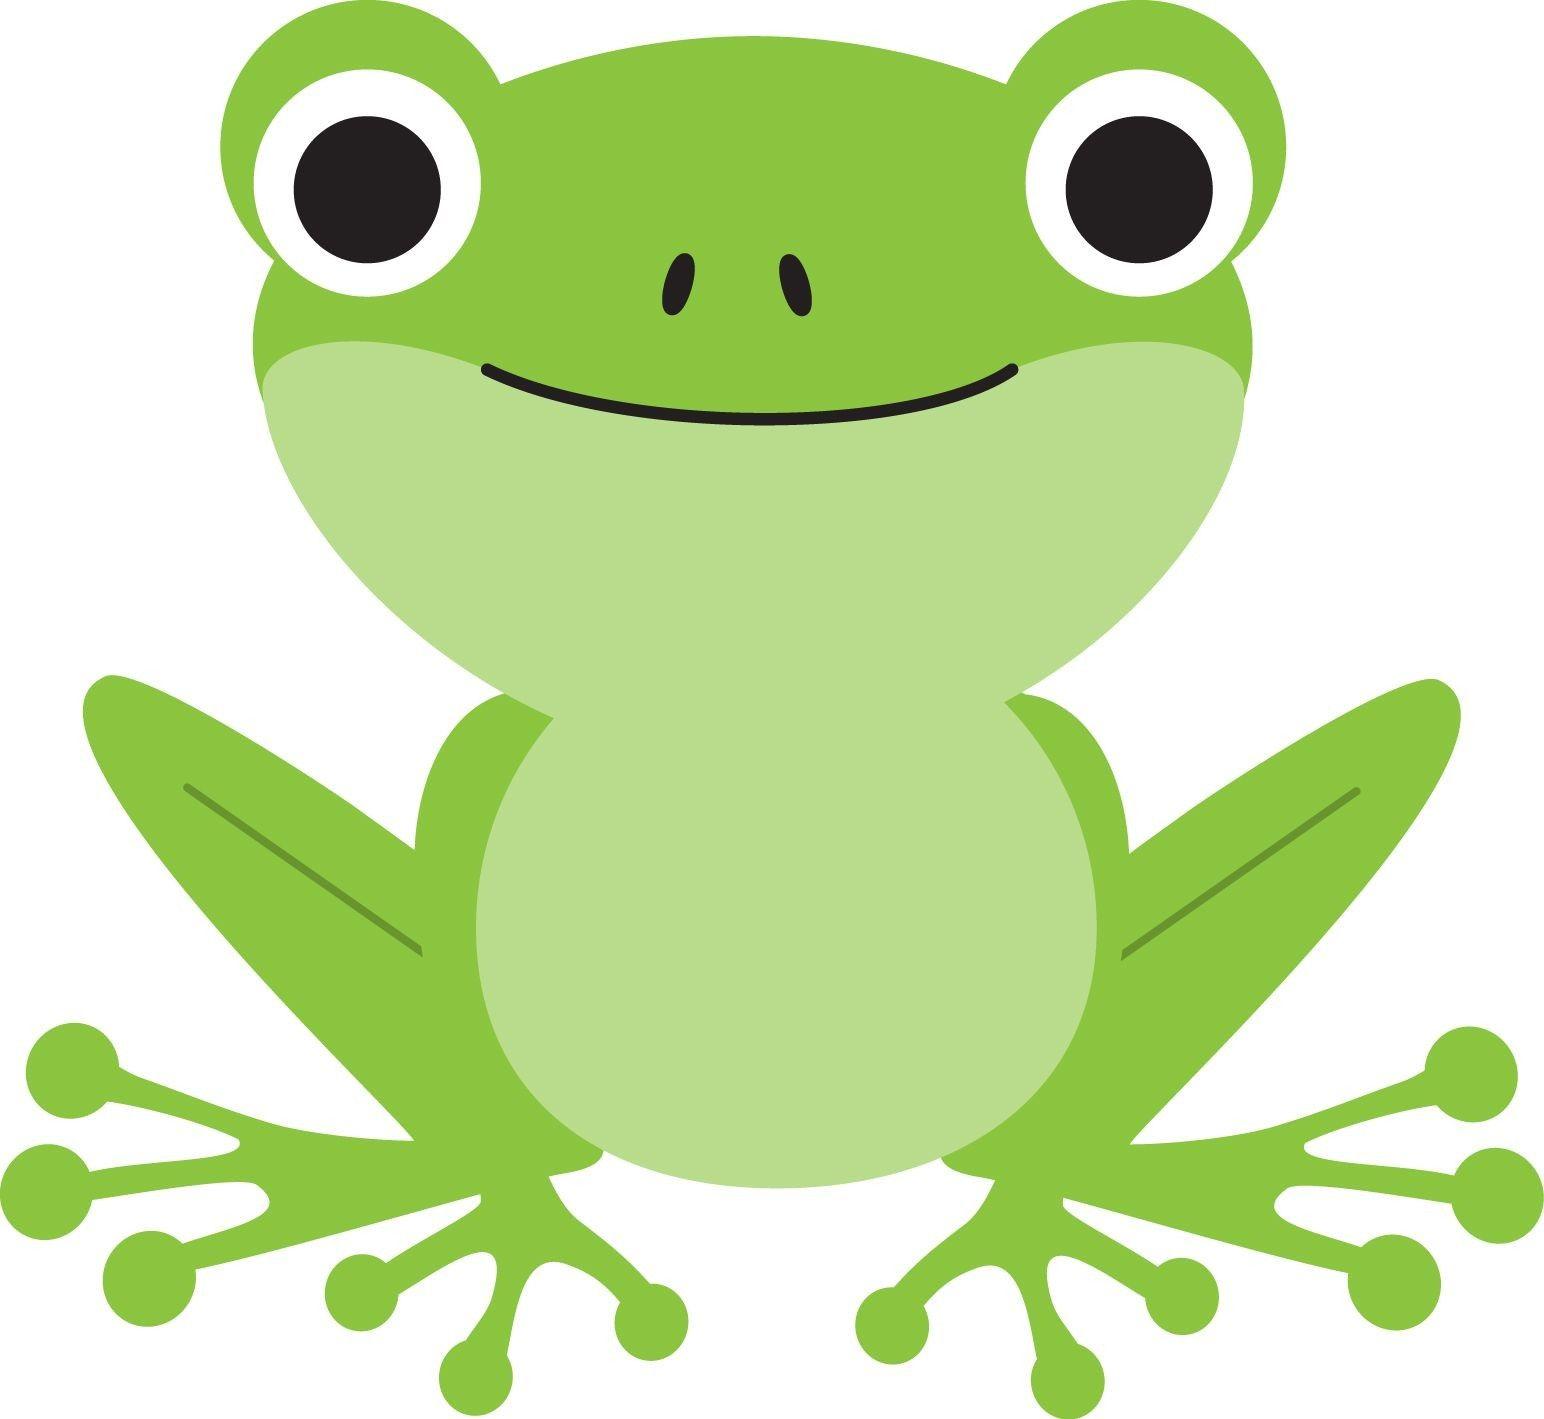 Neu Vorlage Frosch Farbung Malvorlagen Malvorlagenfurkinder Cute Frogs Frog Illustration Art Drawings For Kids